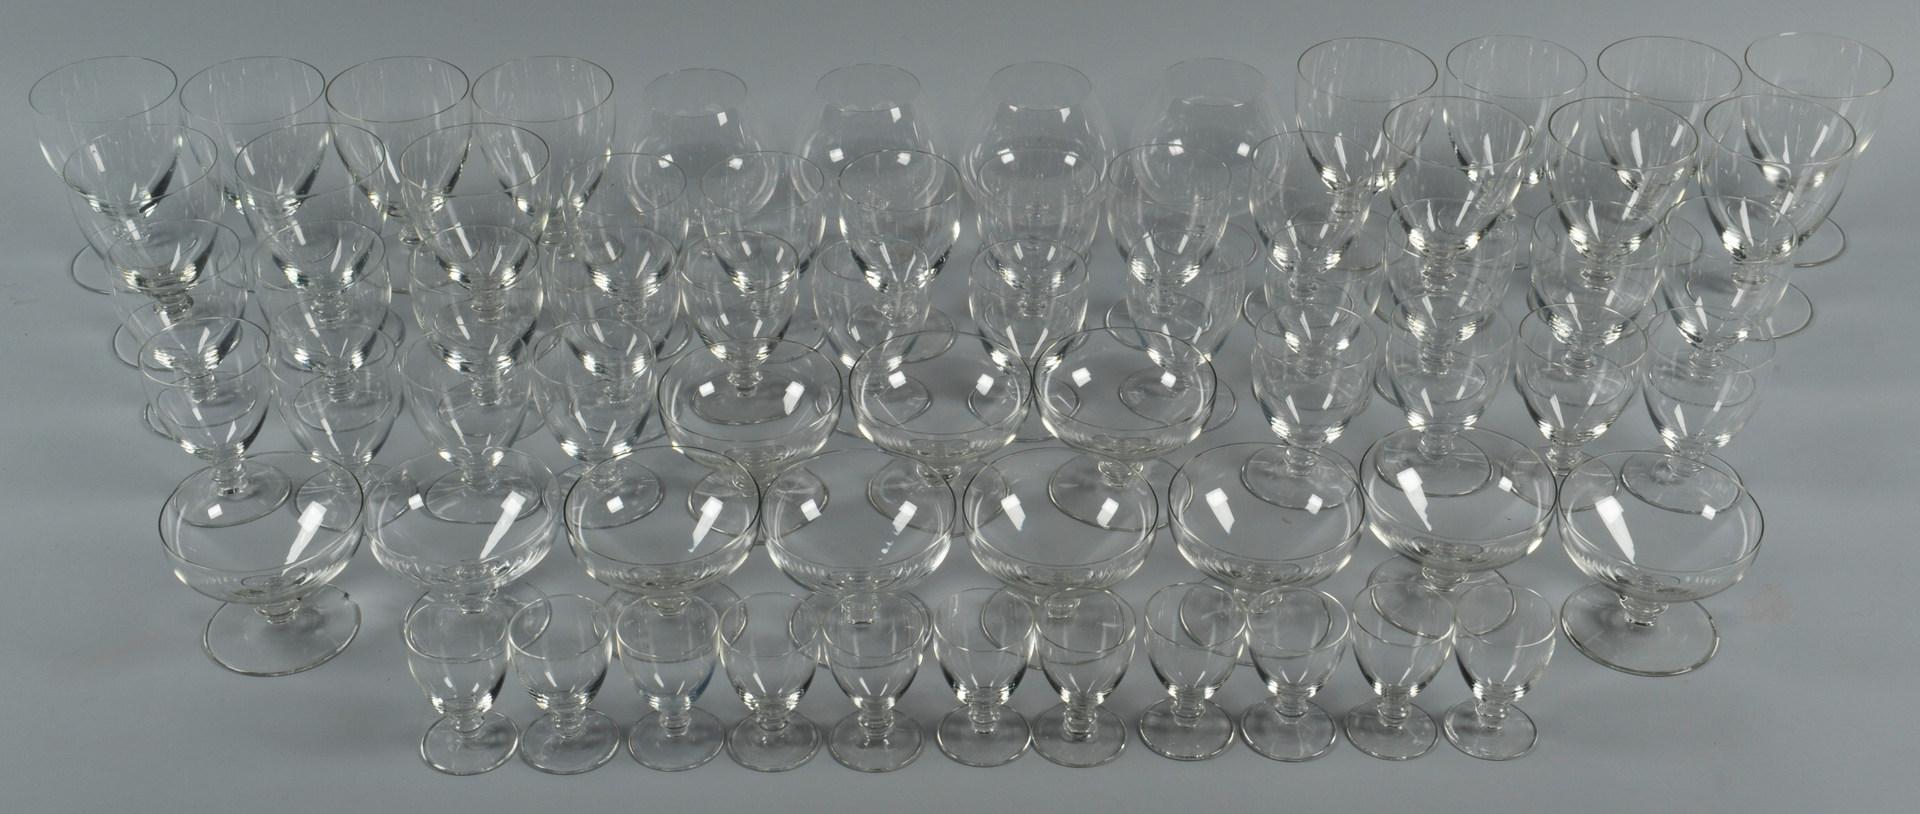 Lot 639: Val St. Lambert Crystal Stemware, 62 pieces